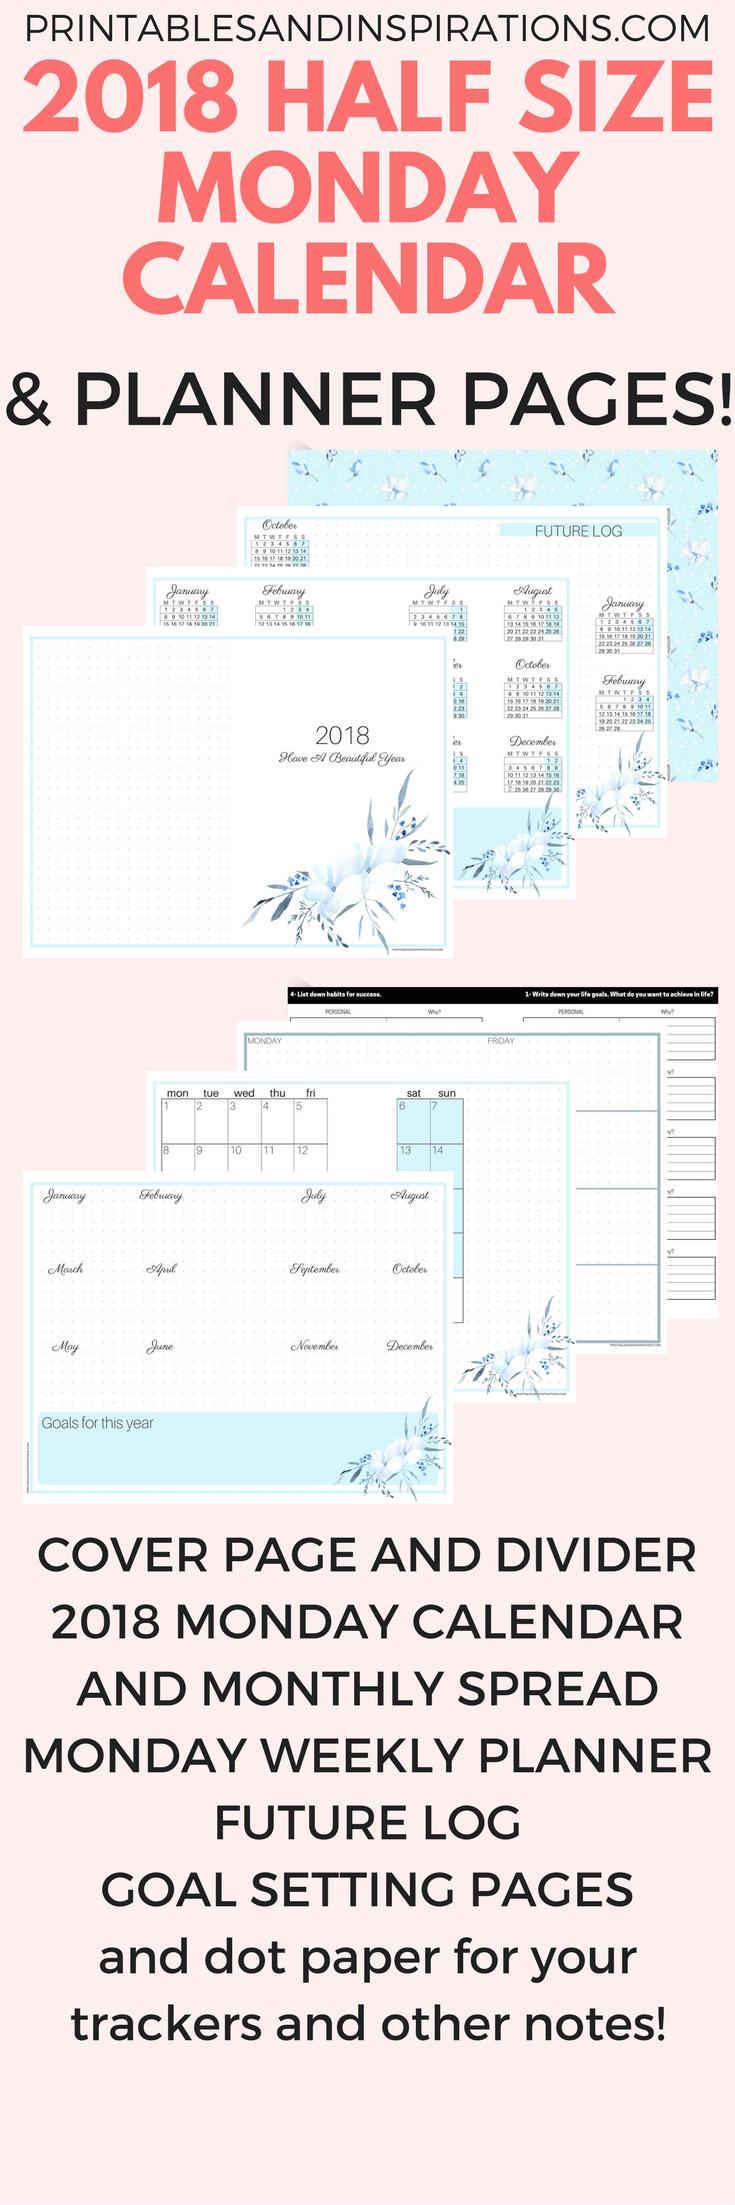 Free Printable Half Size Monday Calendar And 2018 Planner